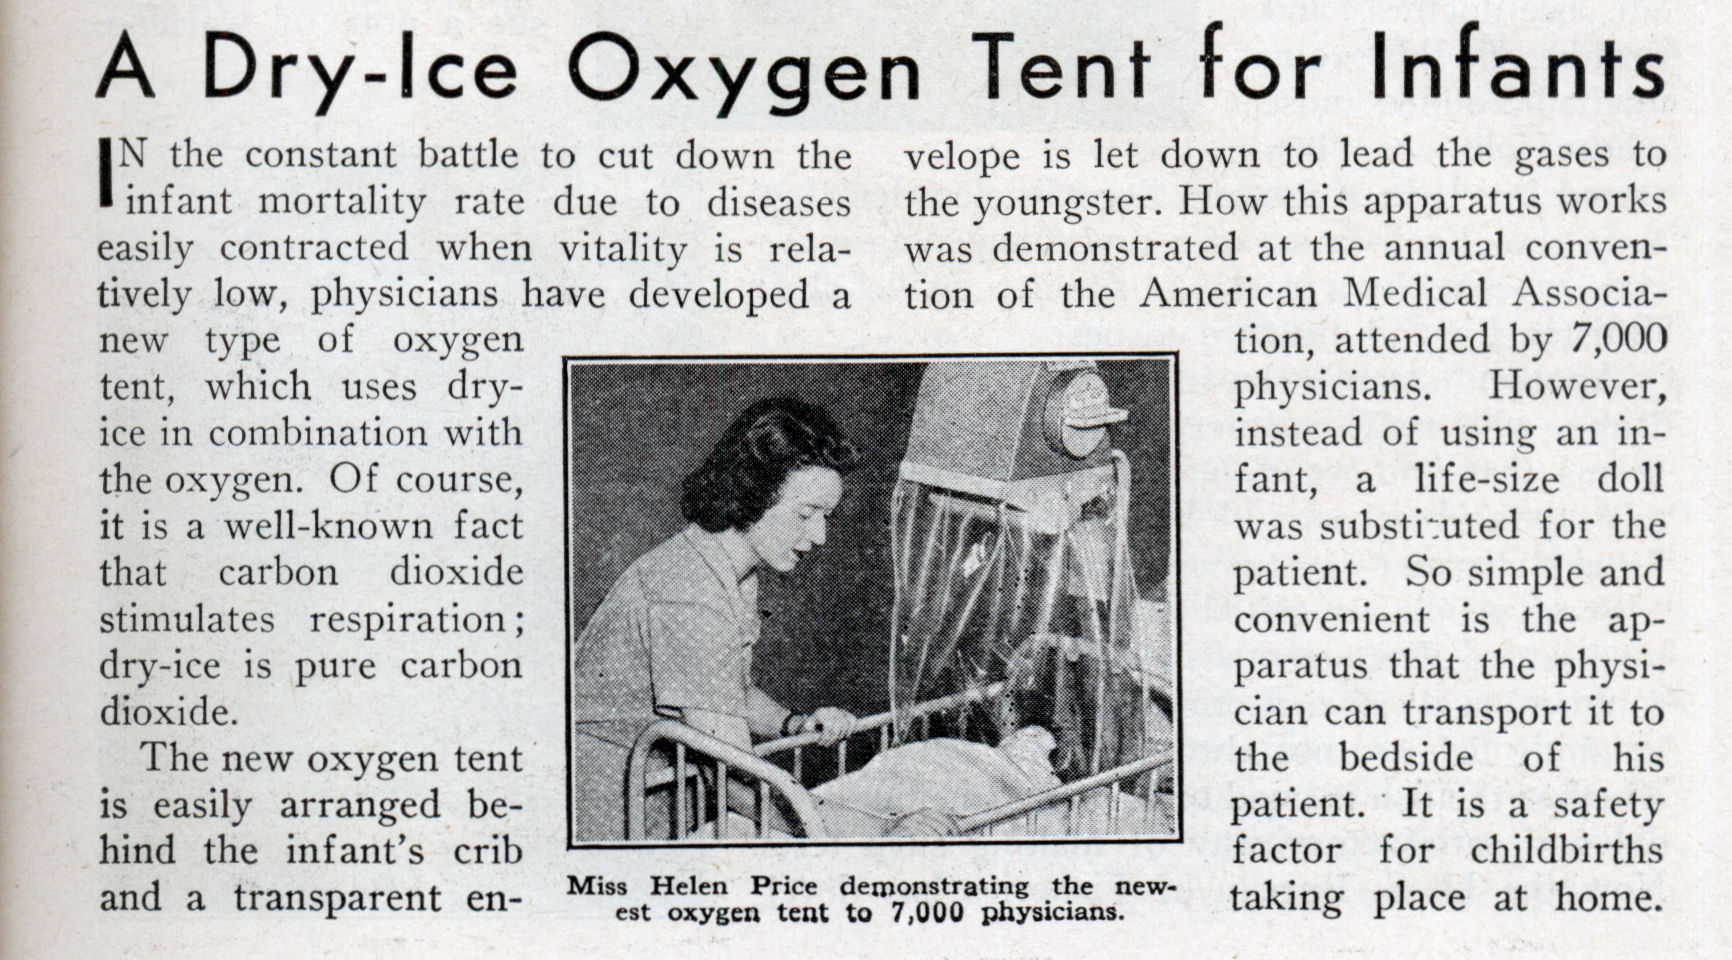 A Dry-Ice Oxygen Tent for Infants (Oct 1938)  sc 1 st  Modern Mechanix & A Dry-Ice Oxygen Tent for Infants | Modern Mechanix